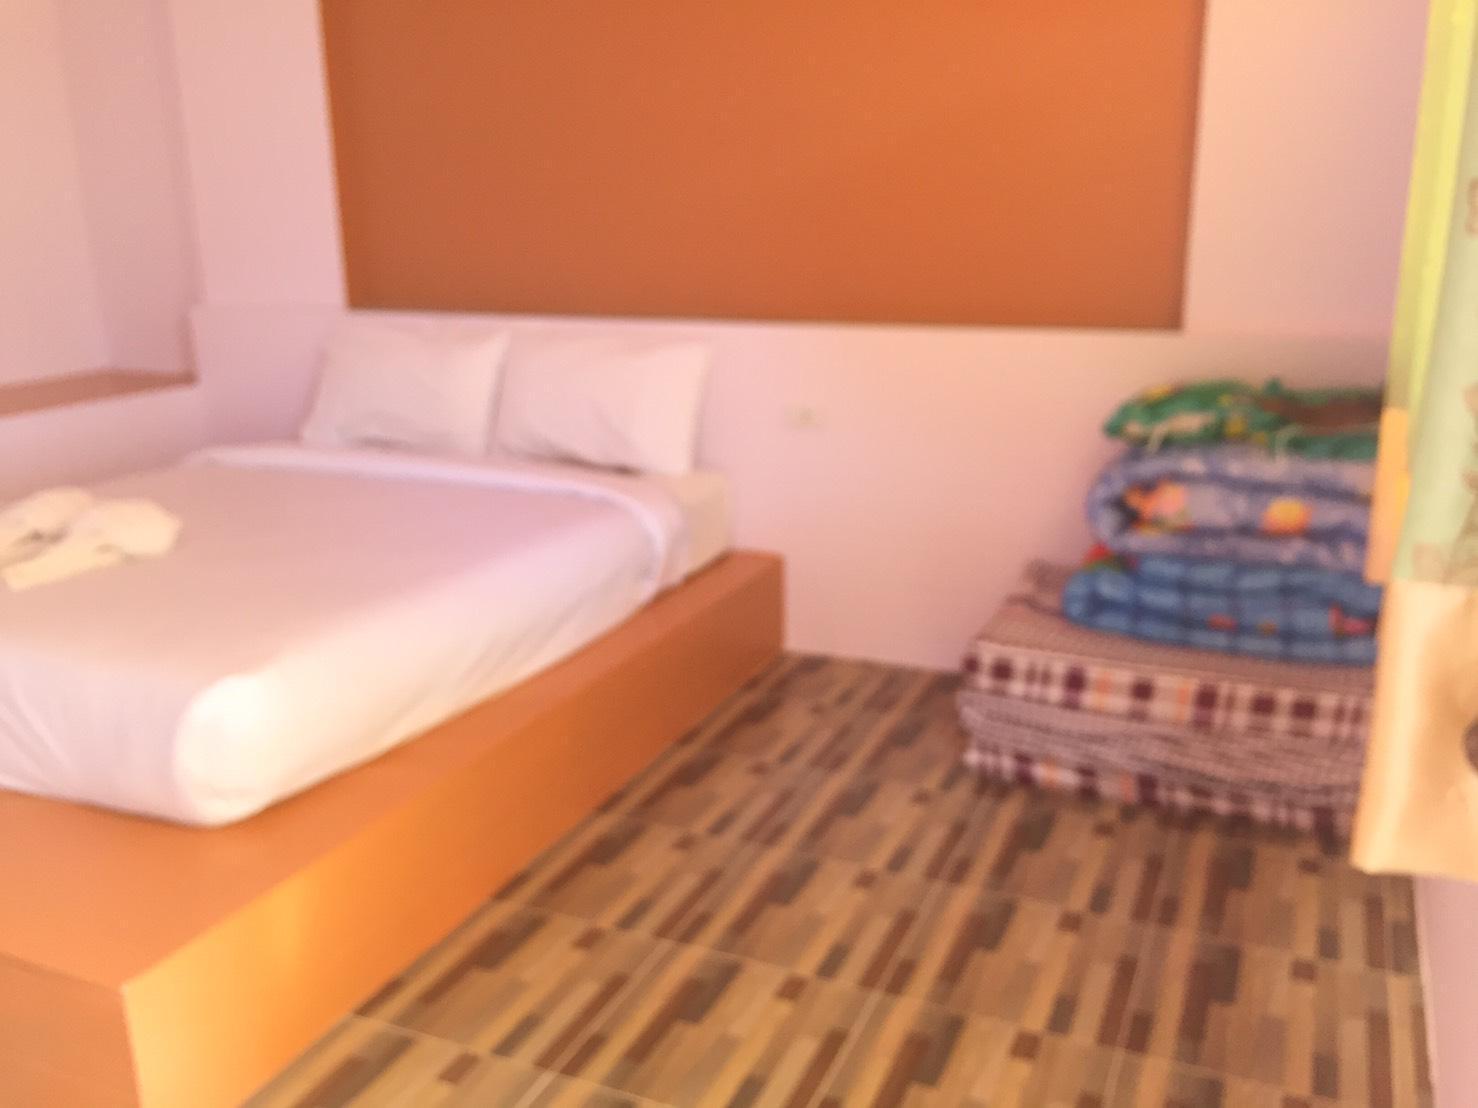 Bhuloolom resort,ภูลู่ลม รีสอร์ต